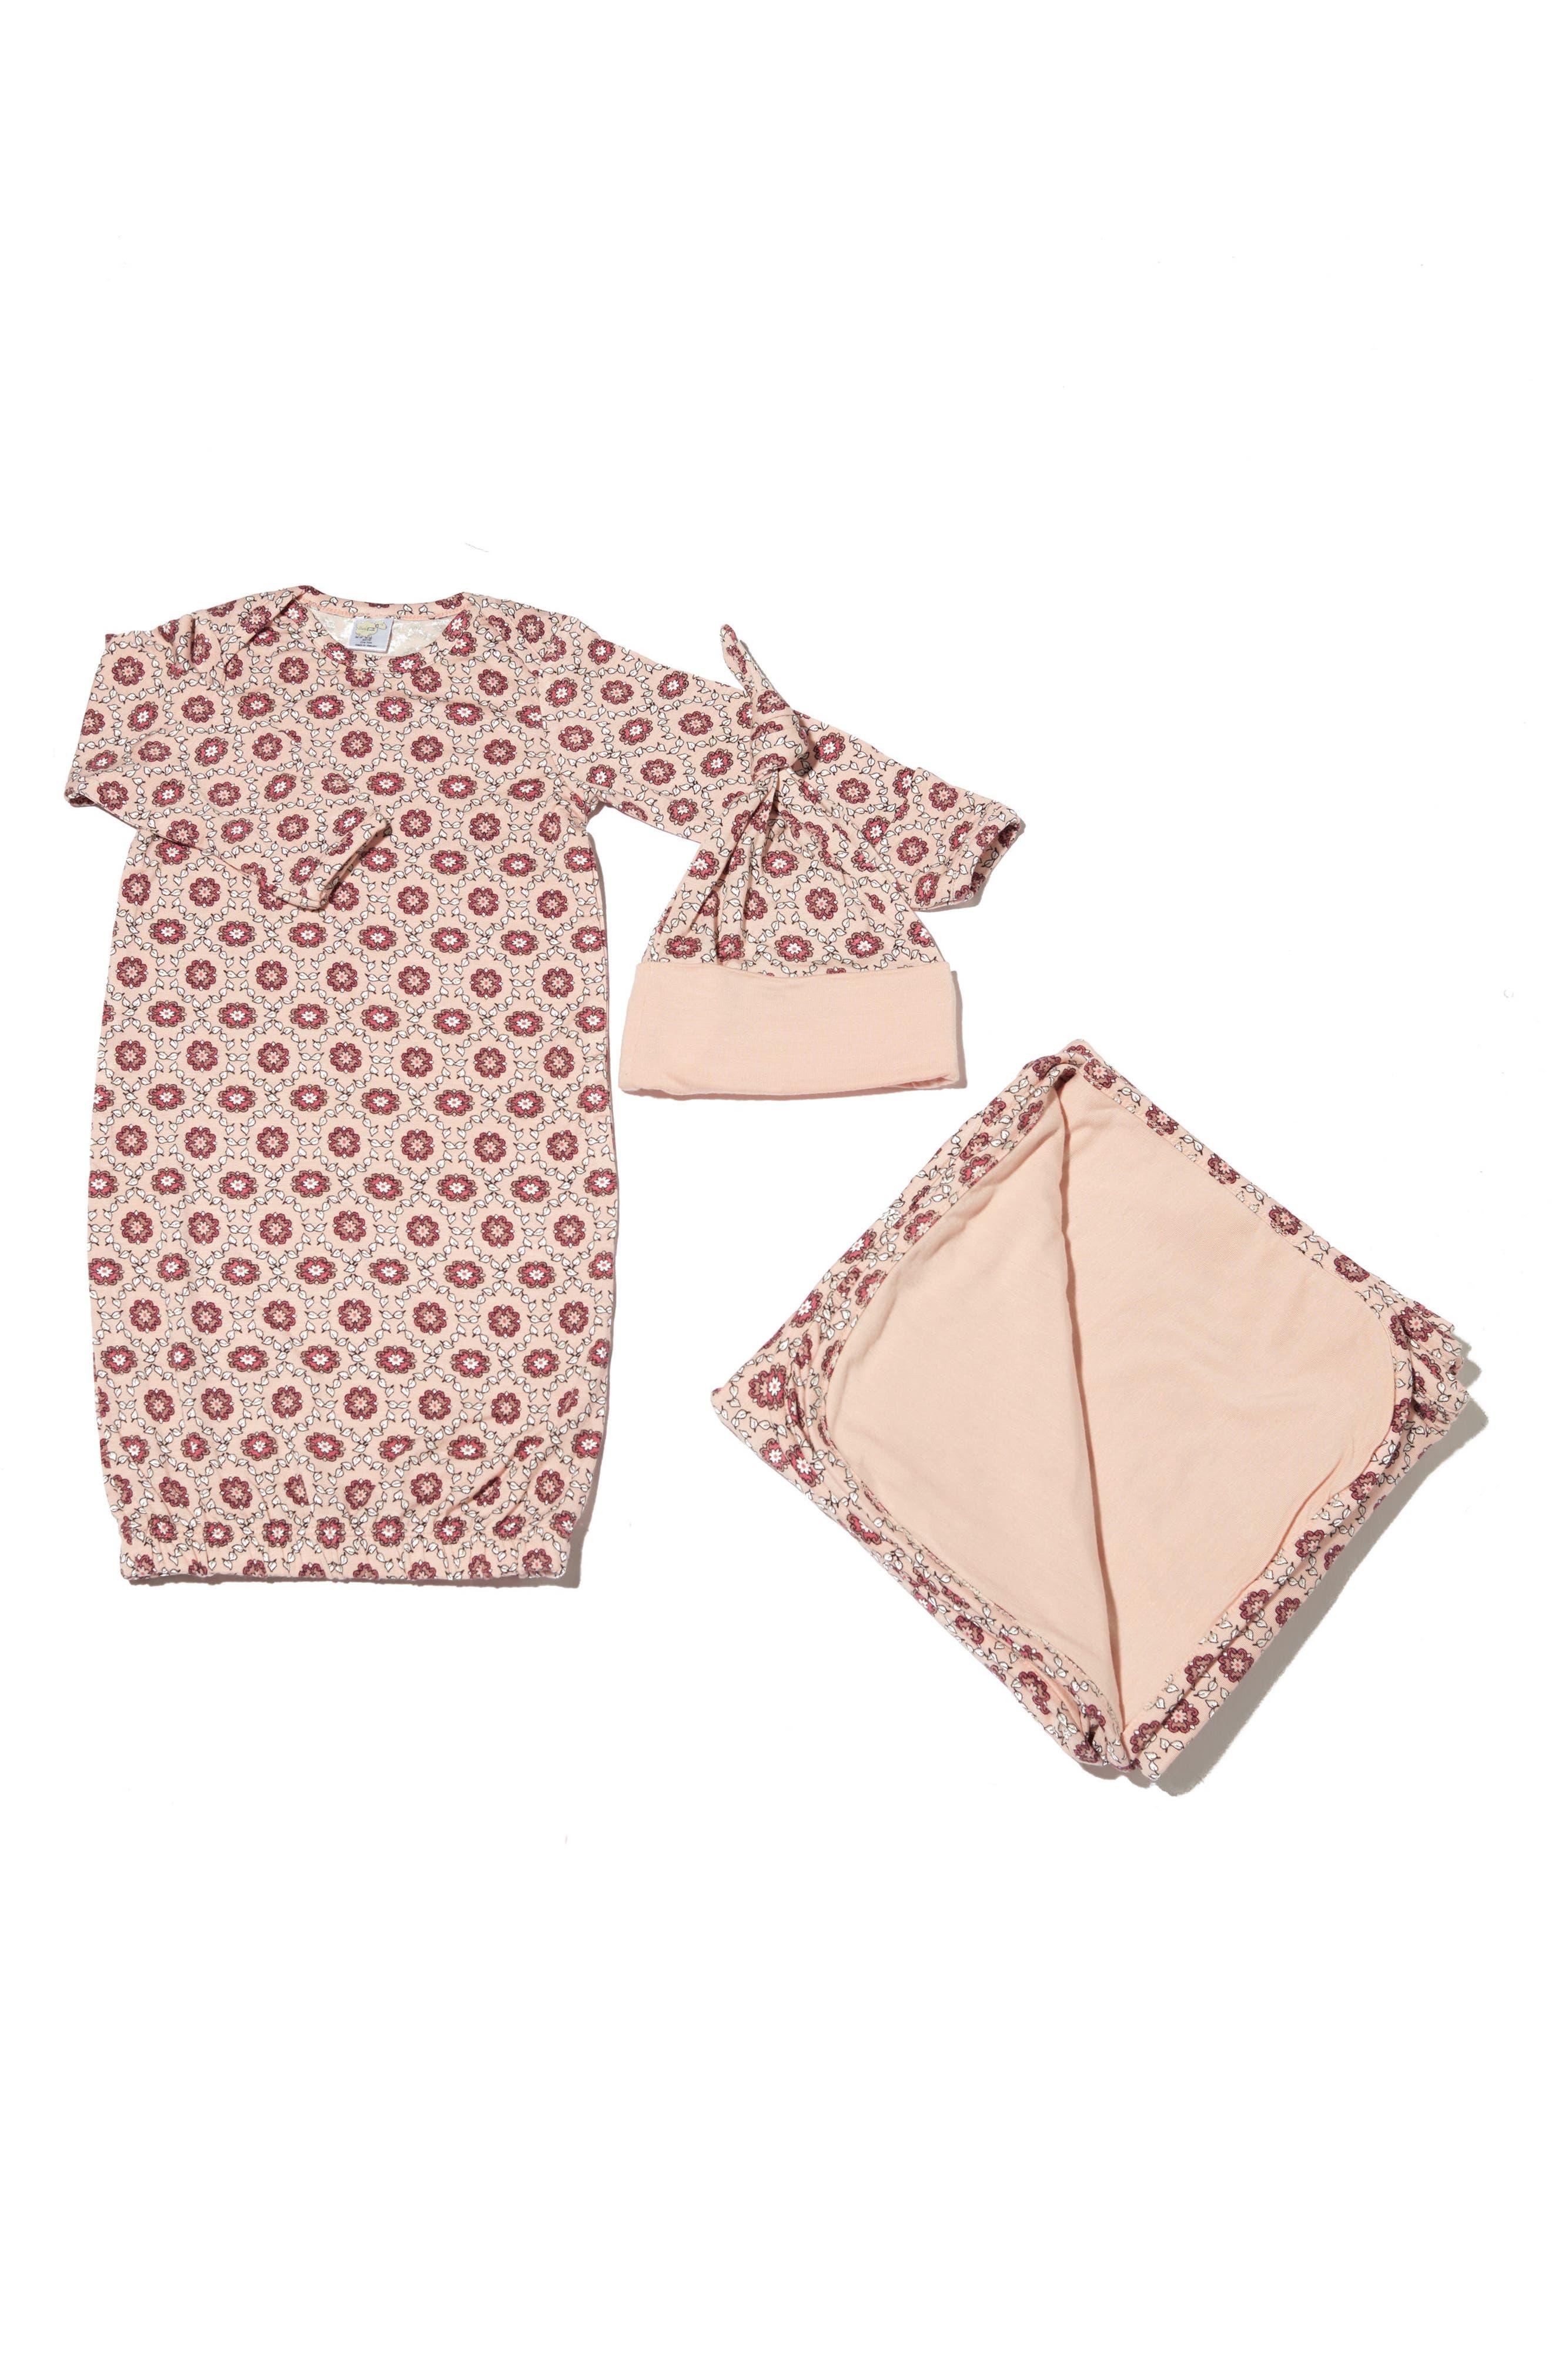 Print Gown, Hat & Blanket Set,                             Main thumbnail 1, color,                             660